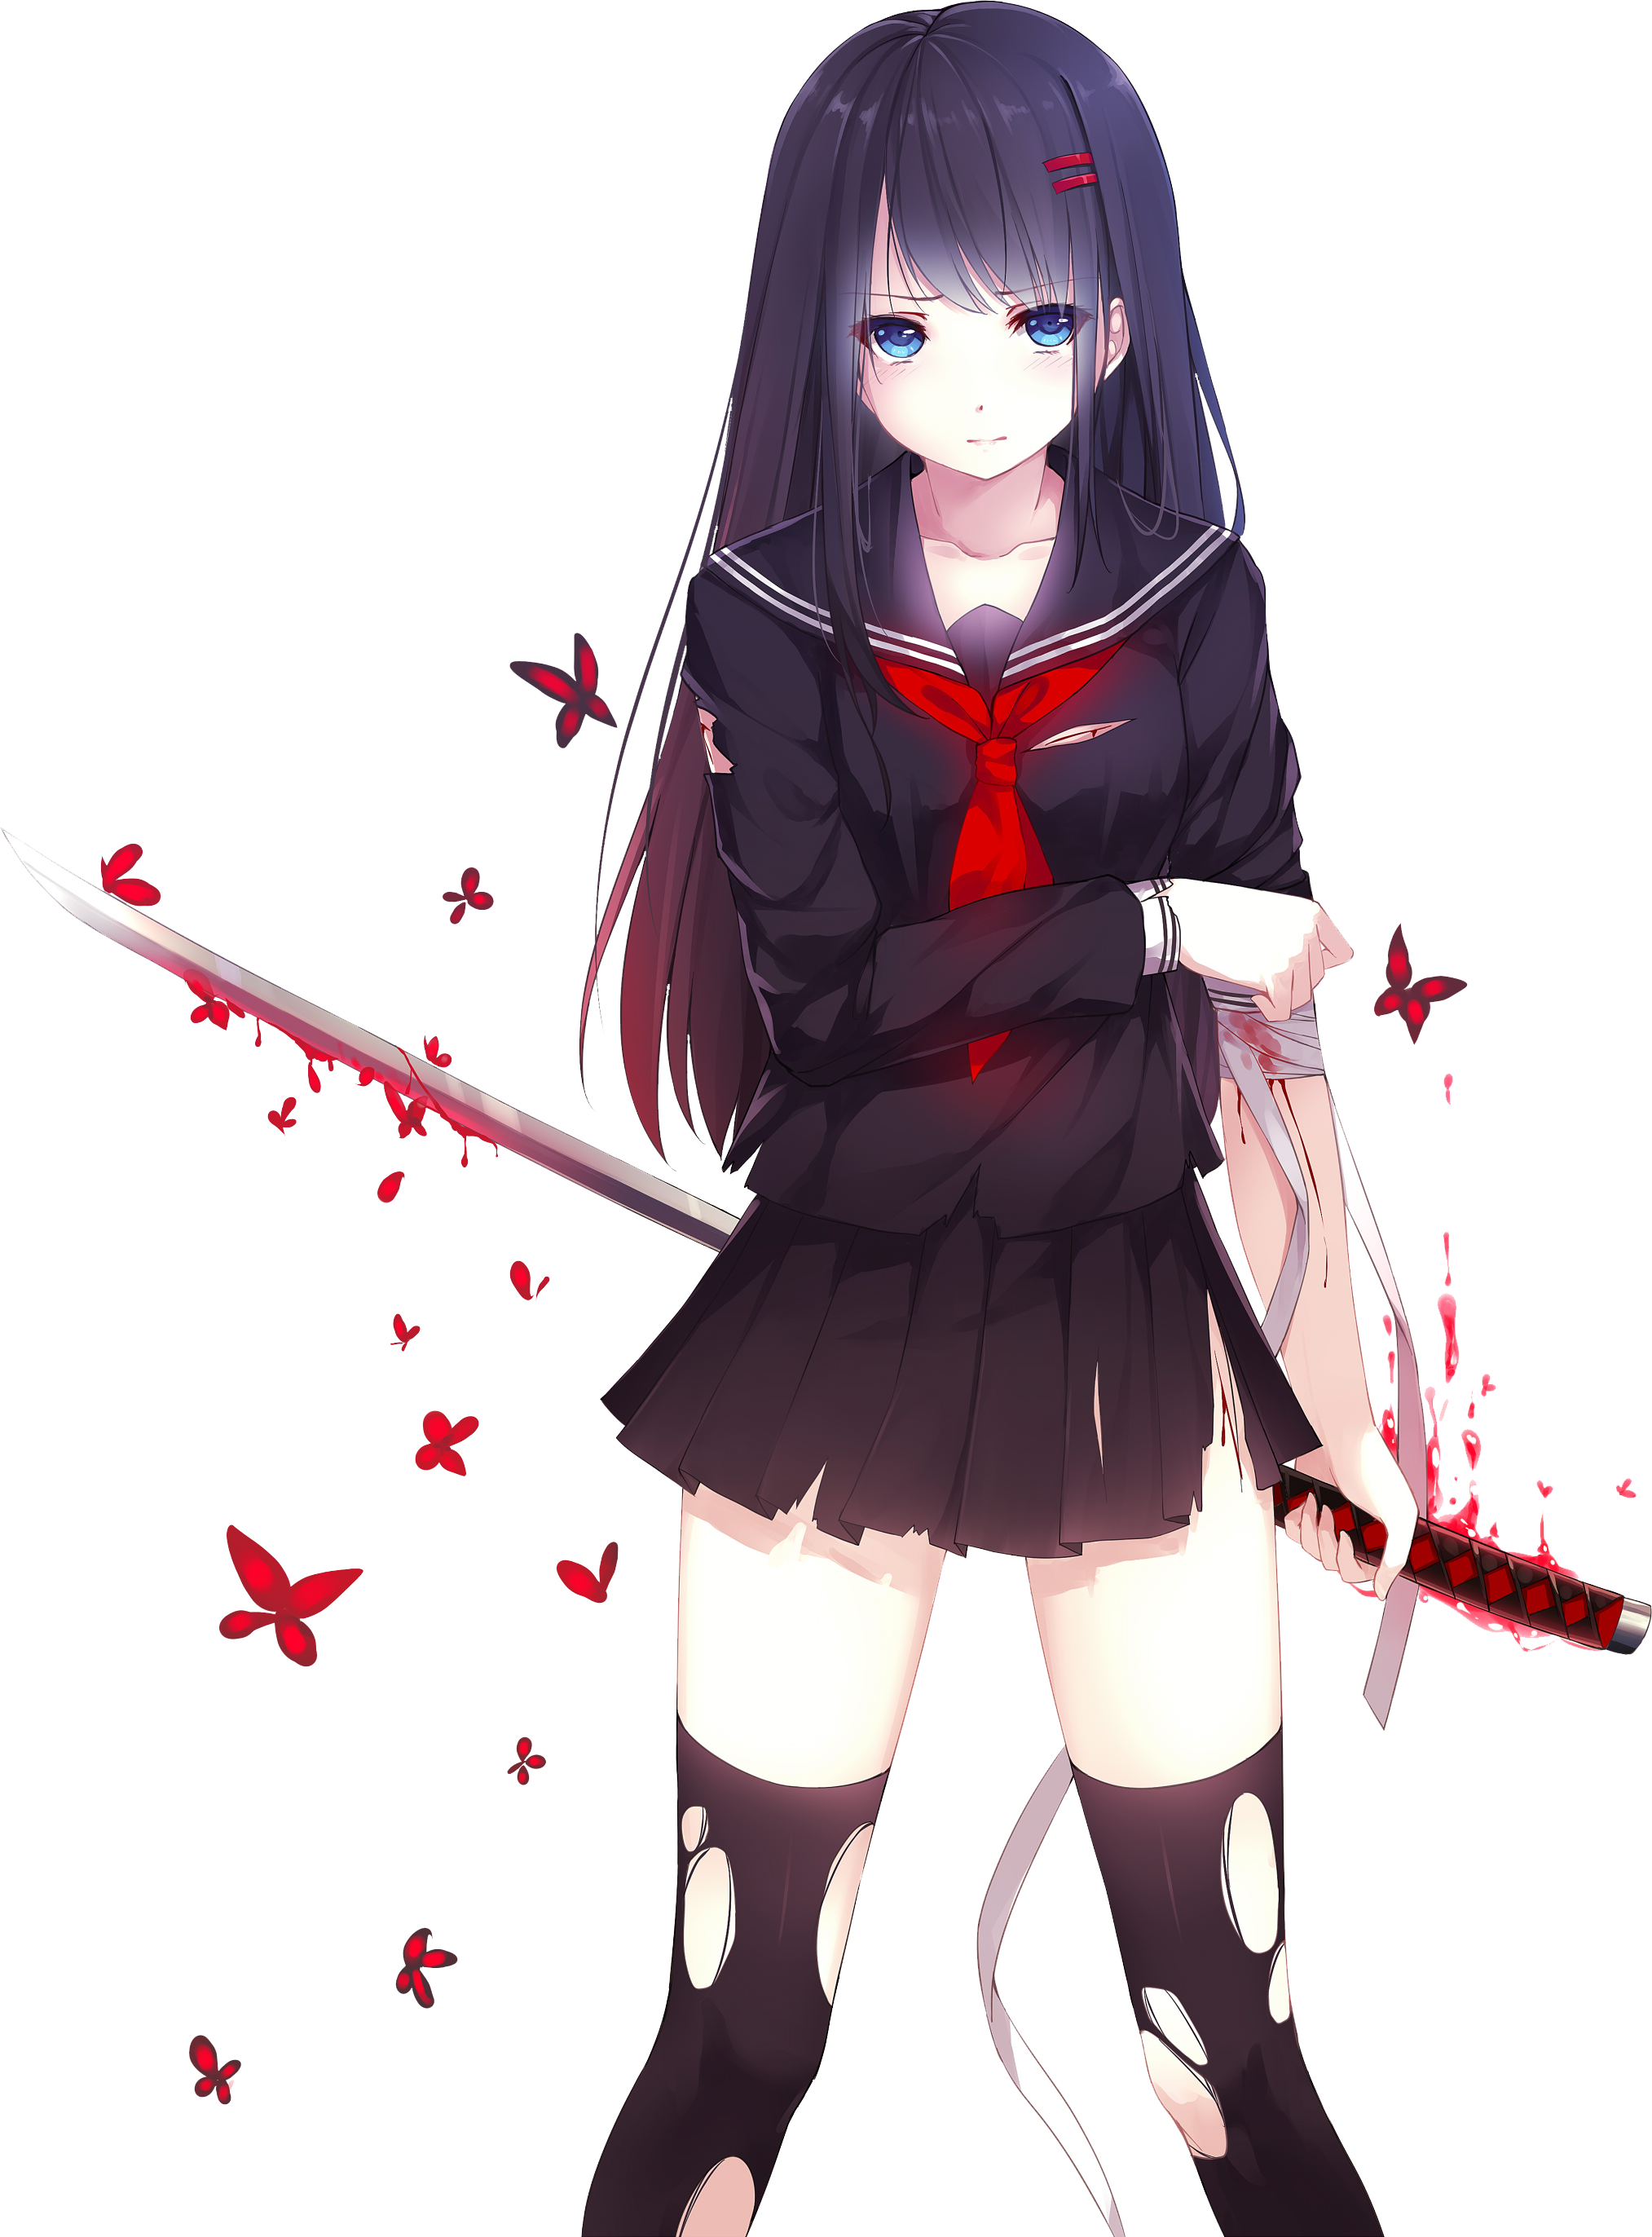 Anime png images. Deviantart more like girl